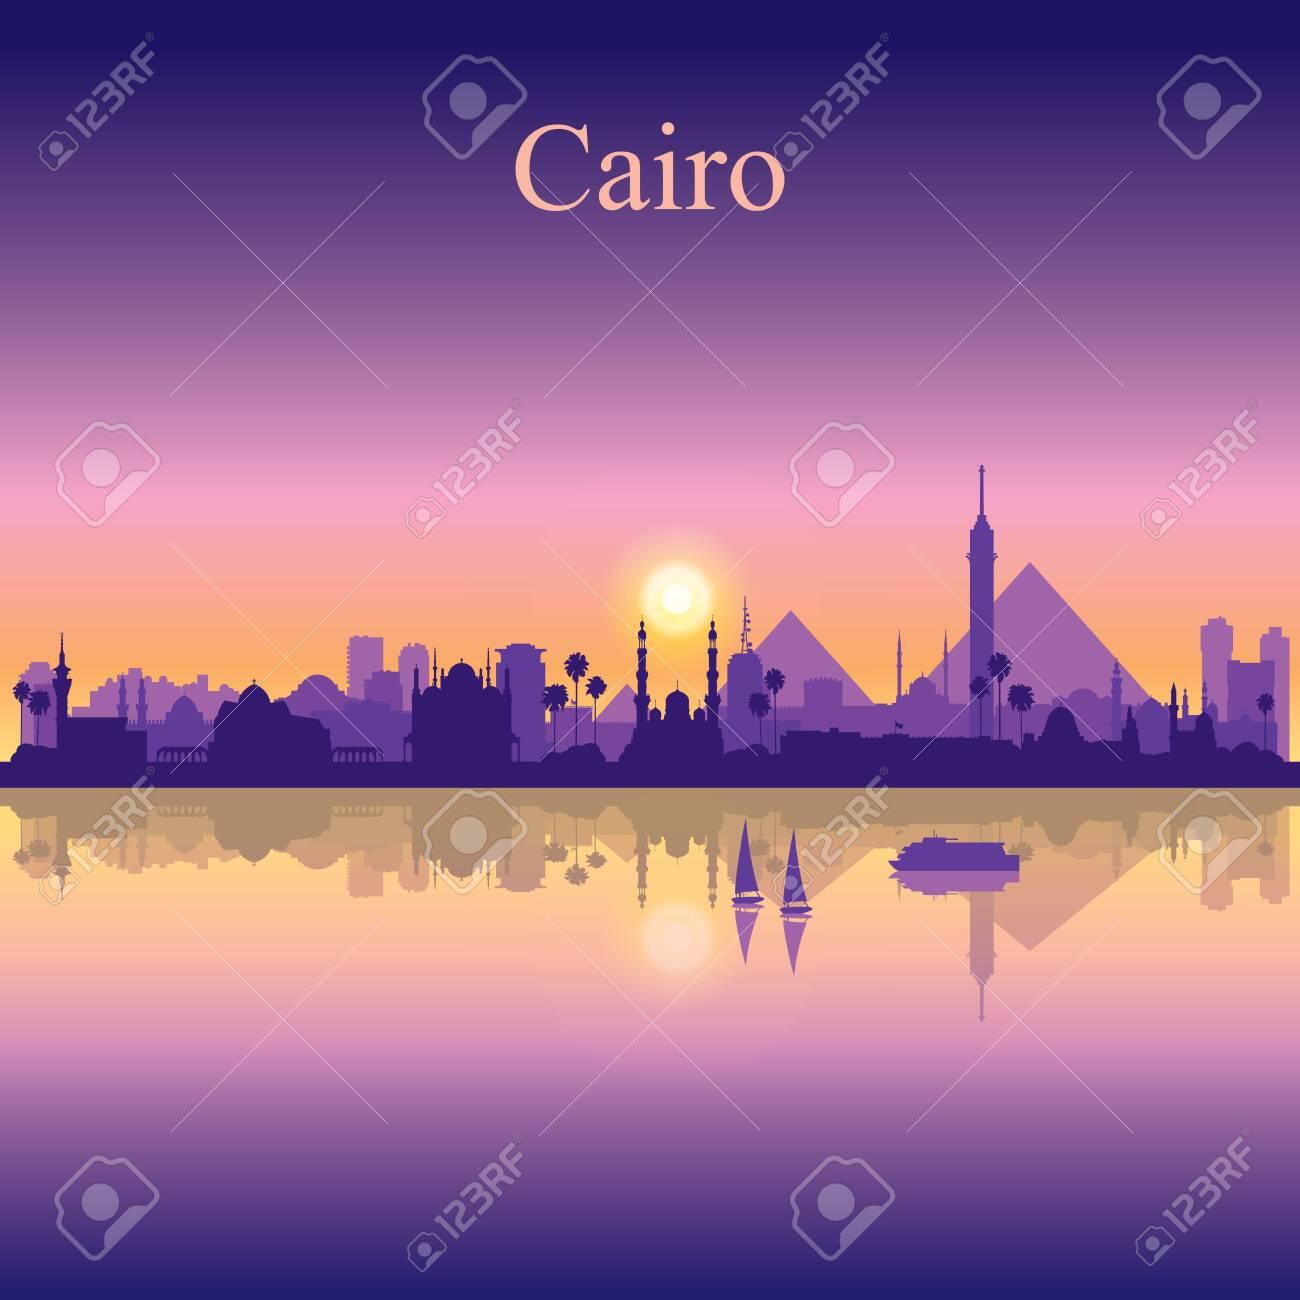 Cairo city silhouette on sunset background vector illustration - 138663761